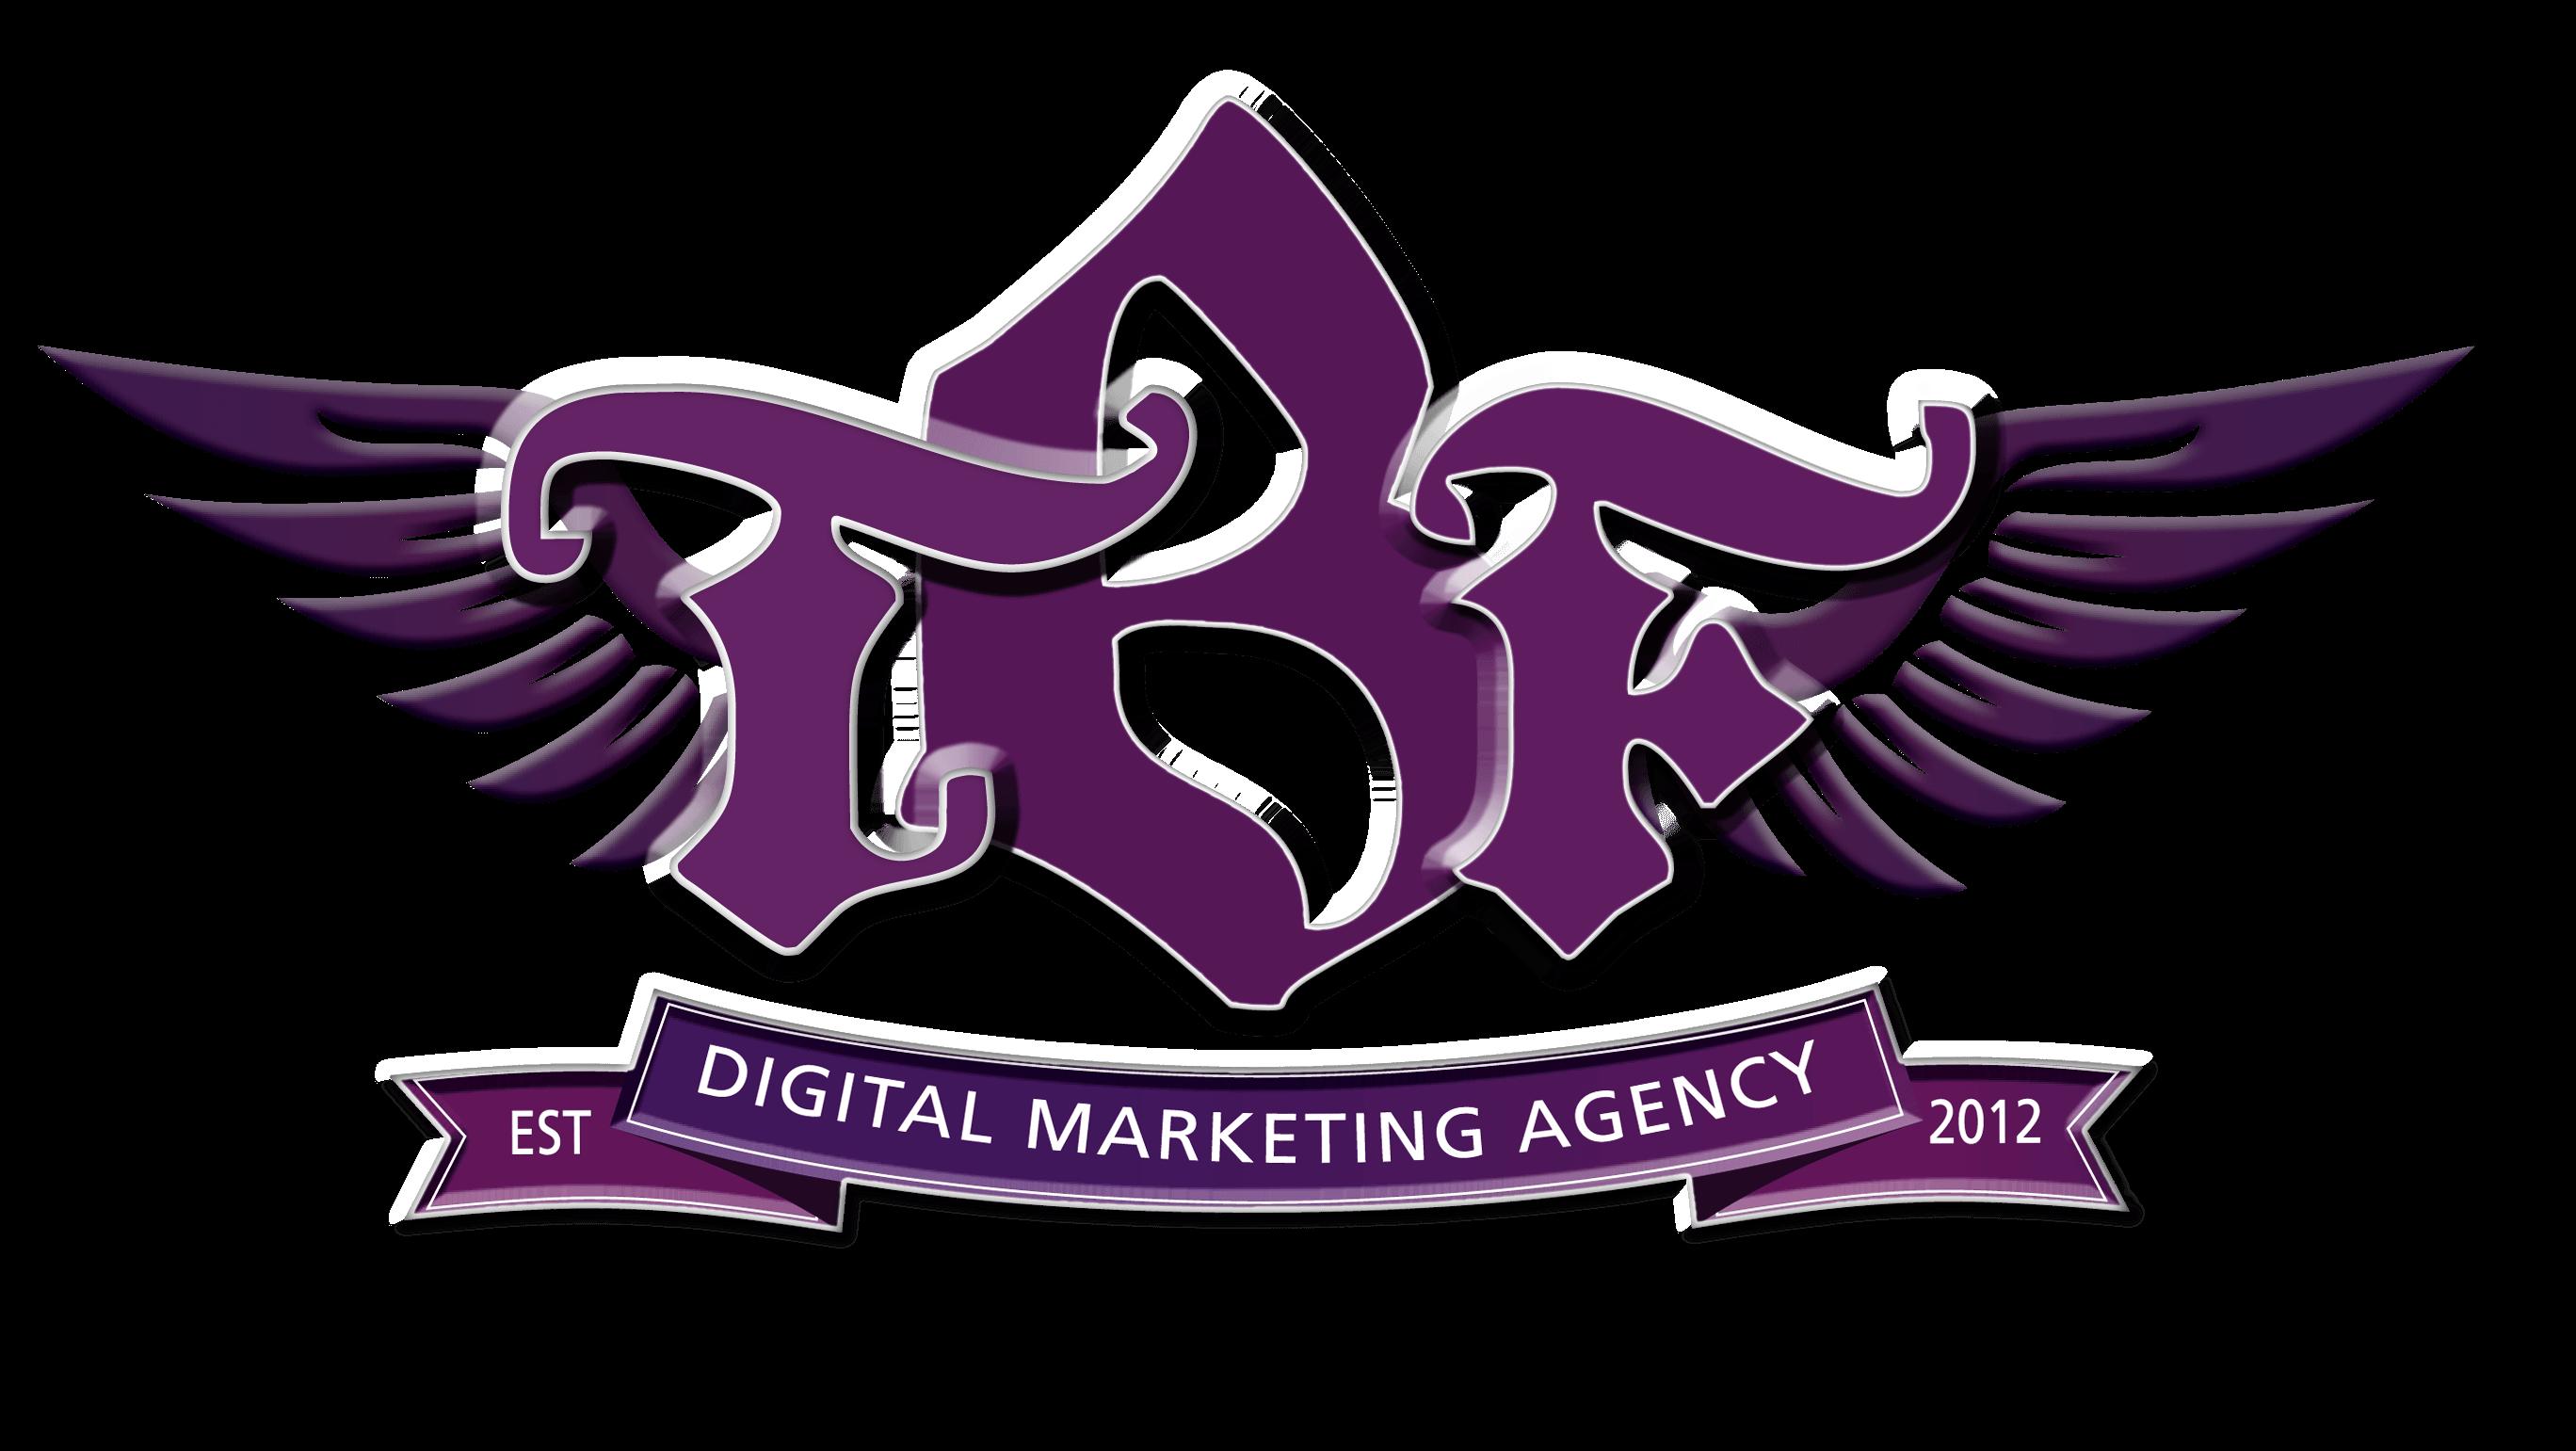 1d72dcf90d04a  digitalmarketing  scientist  business  consultants  training   motiongraphics  webdesign  branding  STEM  SEO  socialmedia  animated   video  videoshorts ...